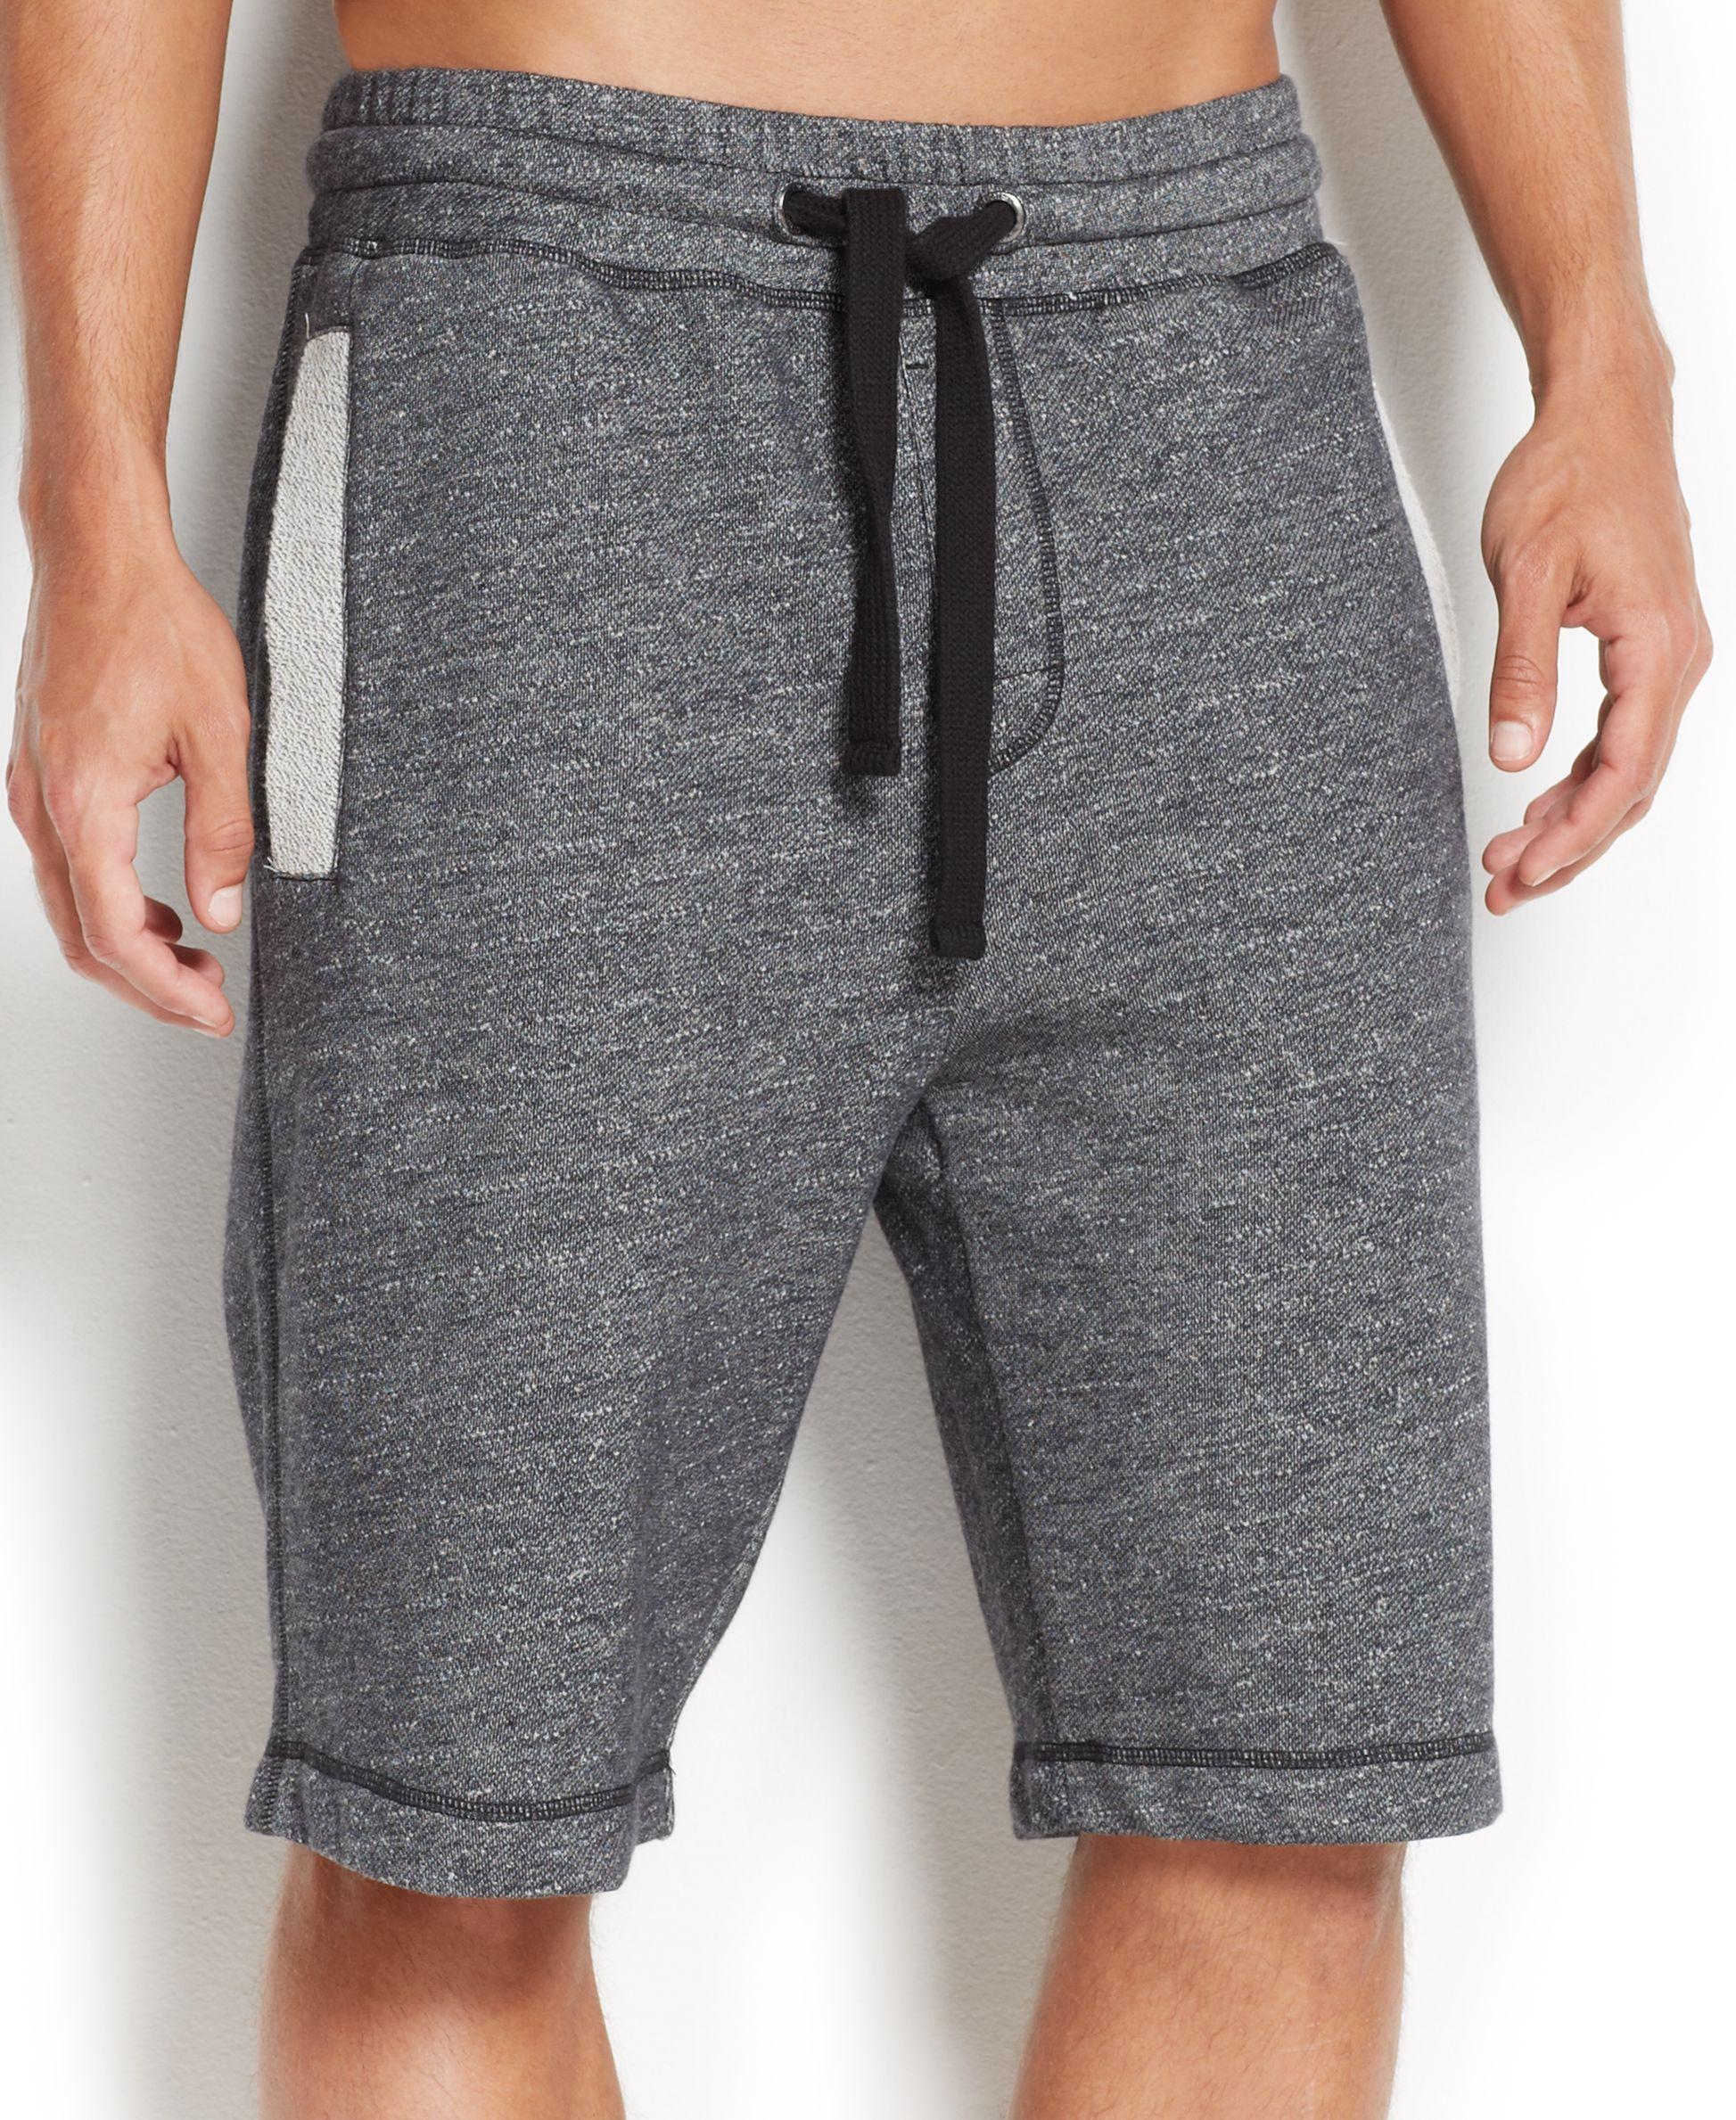 2(x)ist Men's Loungewear, Terry Shorts | Loungewear, Shorts and ...